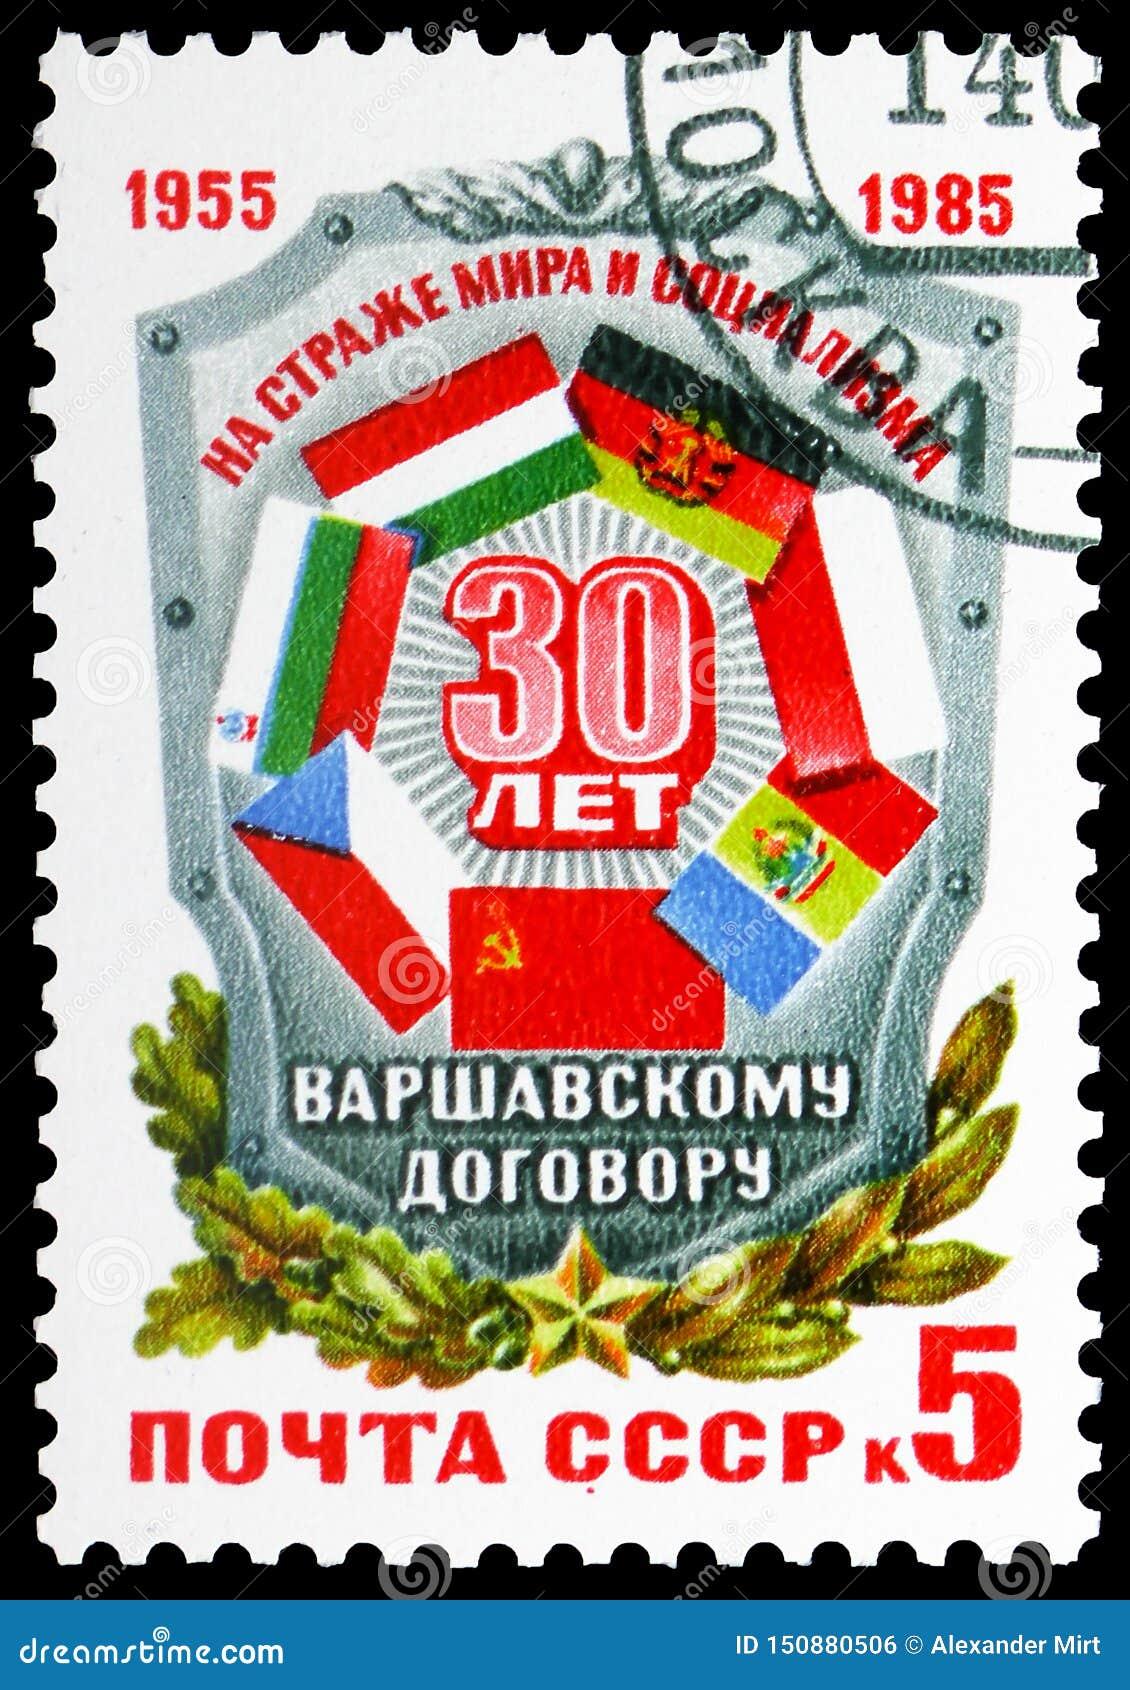 30th Anniversary of Warsaw Pact Organization, circa 1985